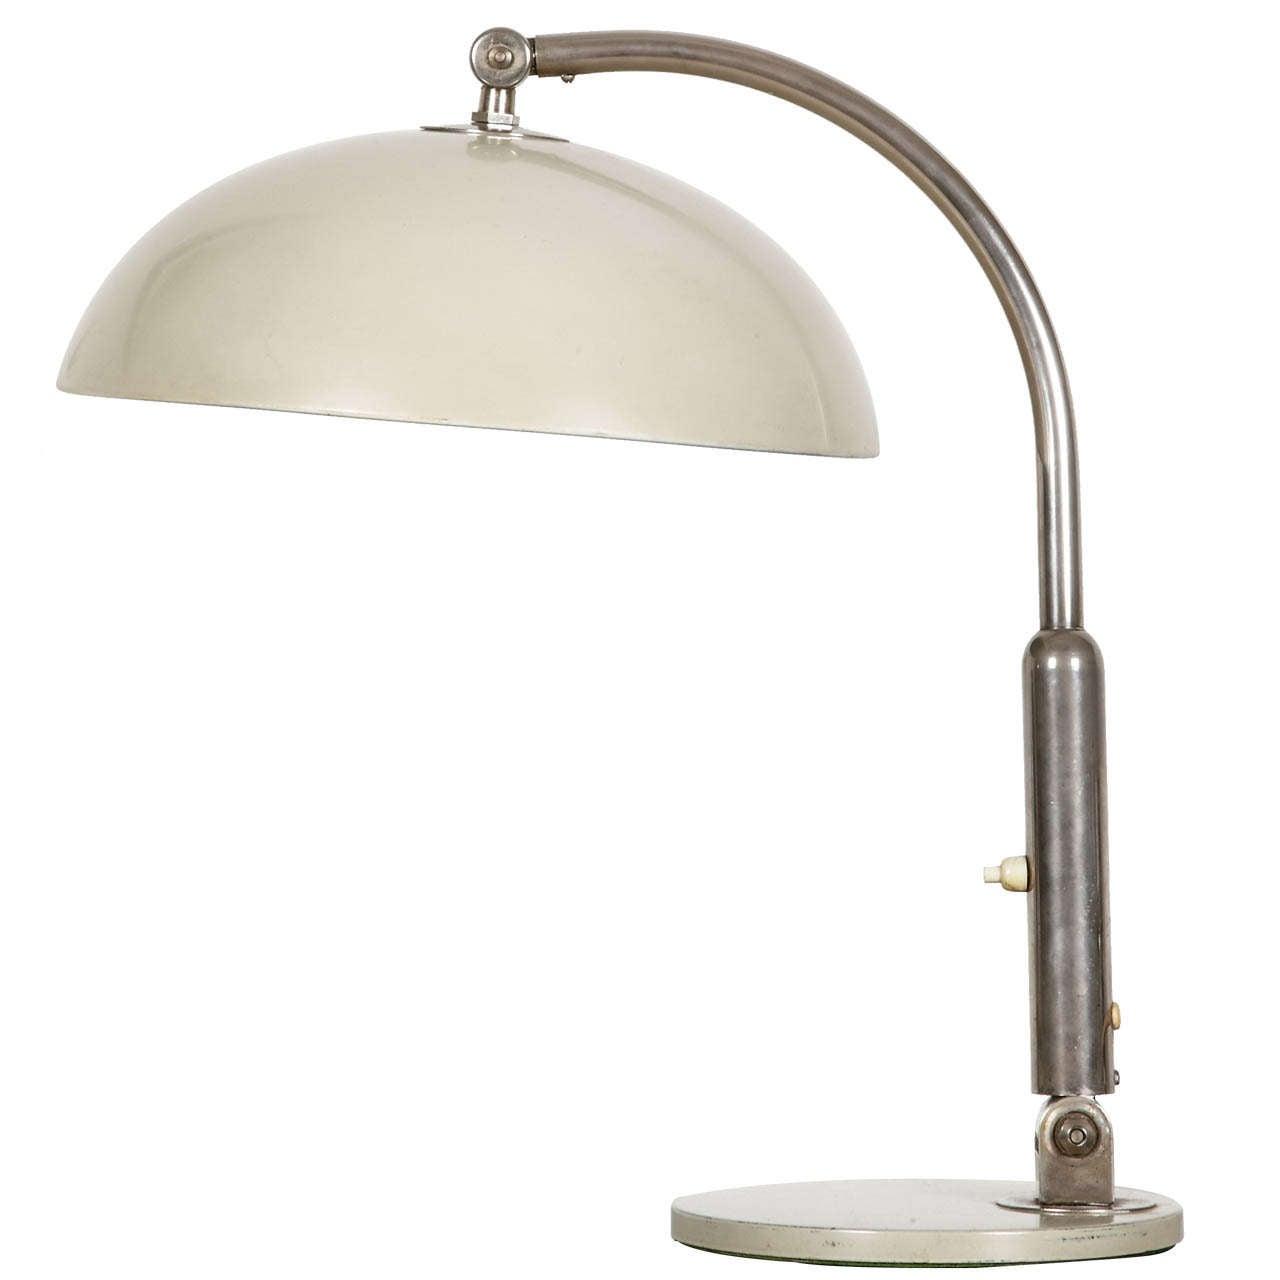 Bauhaus Table Lamp Hala designed by Busquet Circa 1930 at 1stdibs